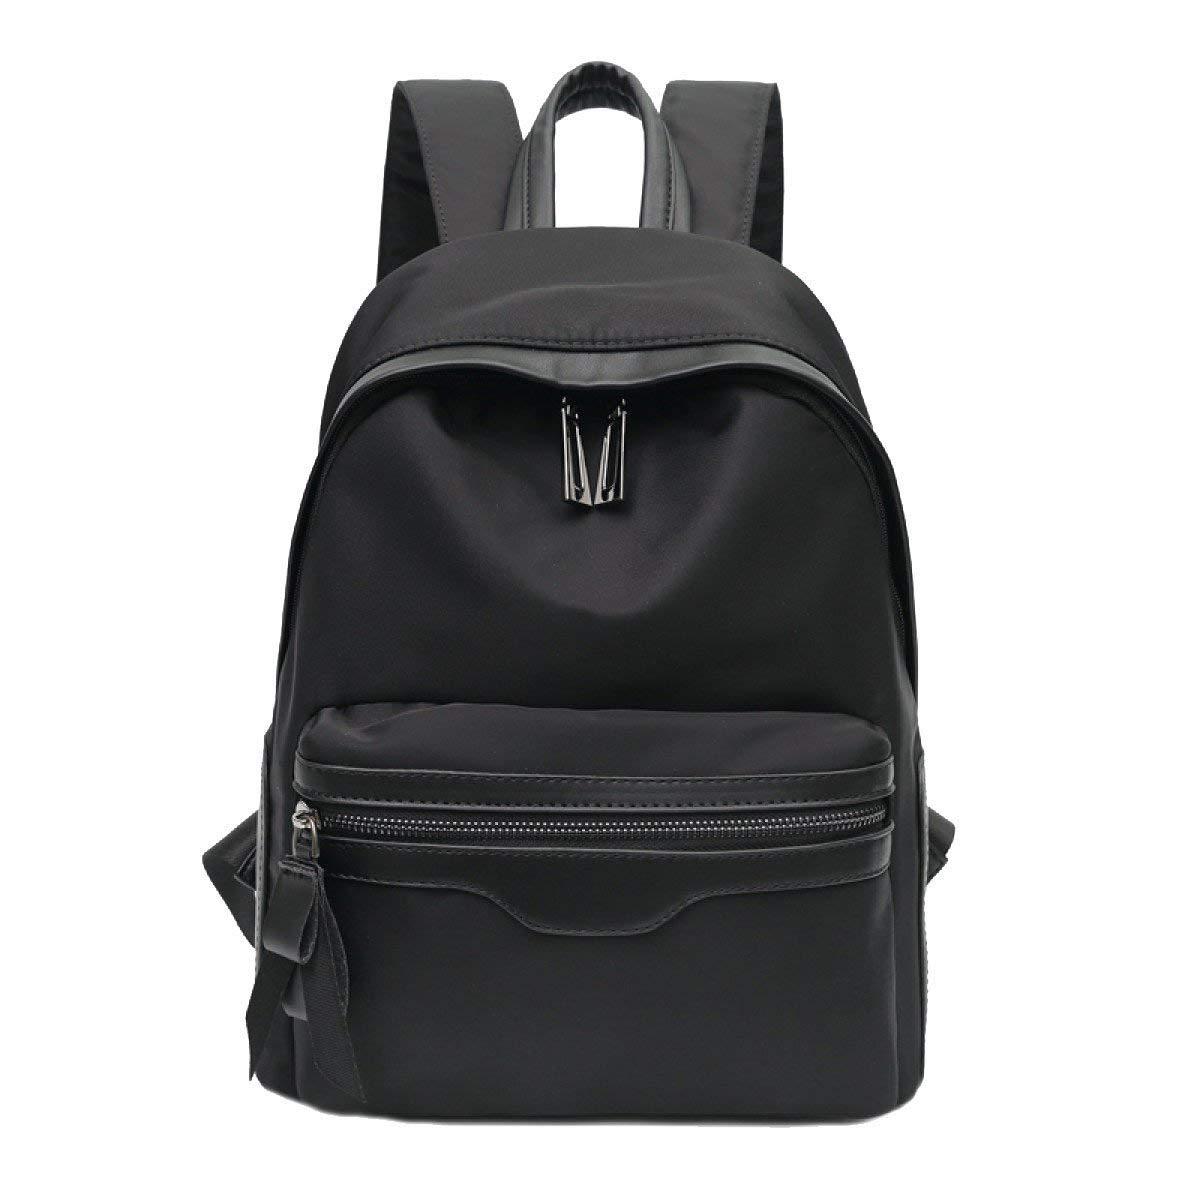 Black Medium Kin Canvas Backpack Purse Travel Water Resistant Large Lightweight School Backpacks for Women Nylon Casual Backpack